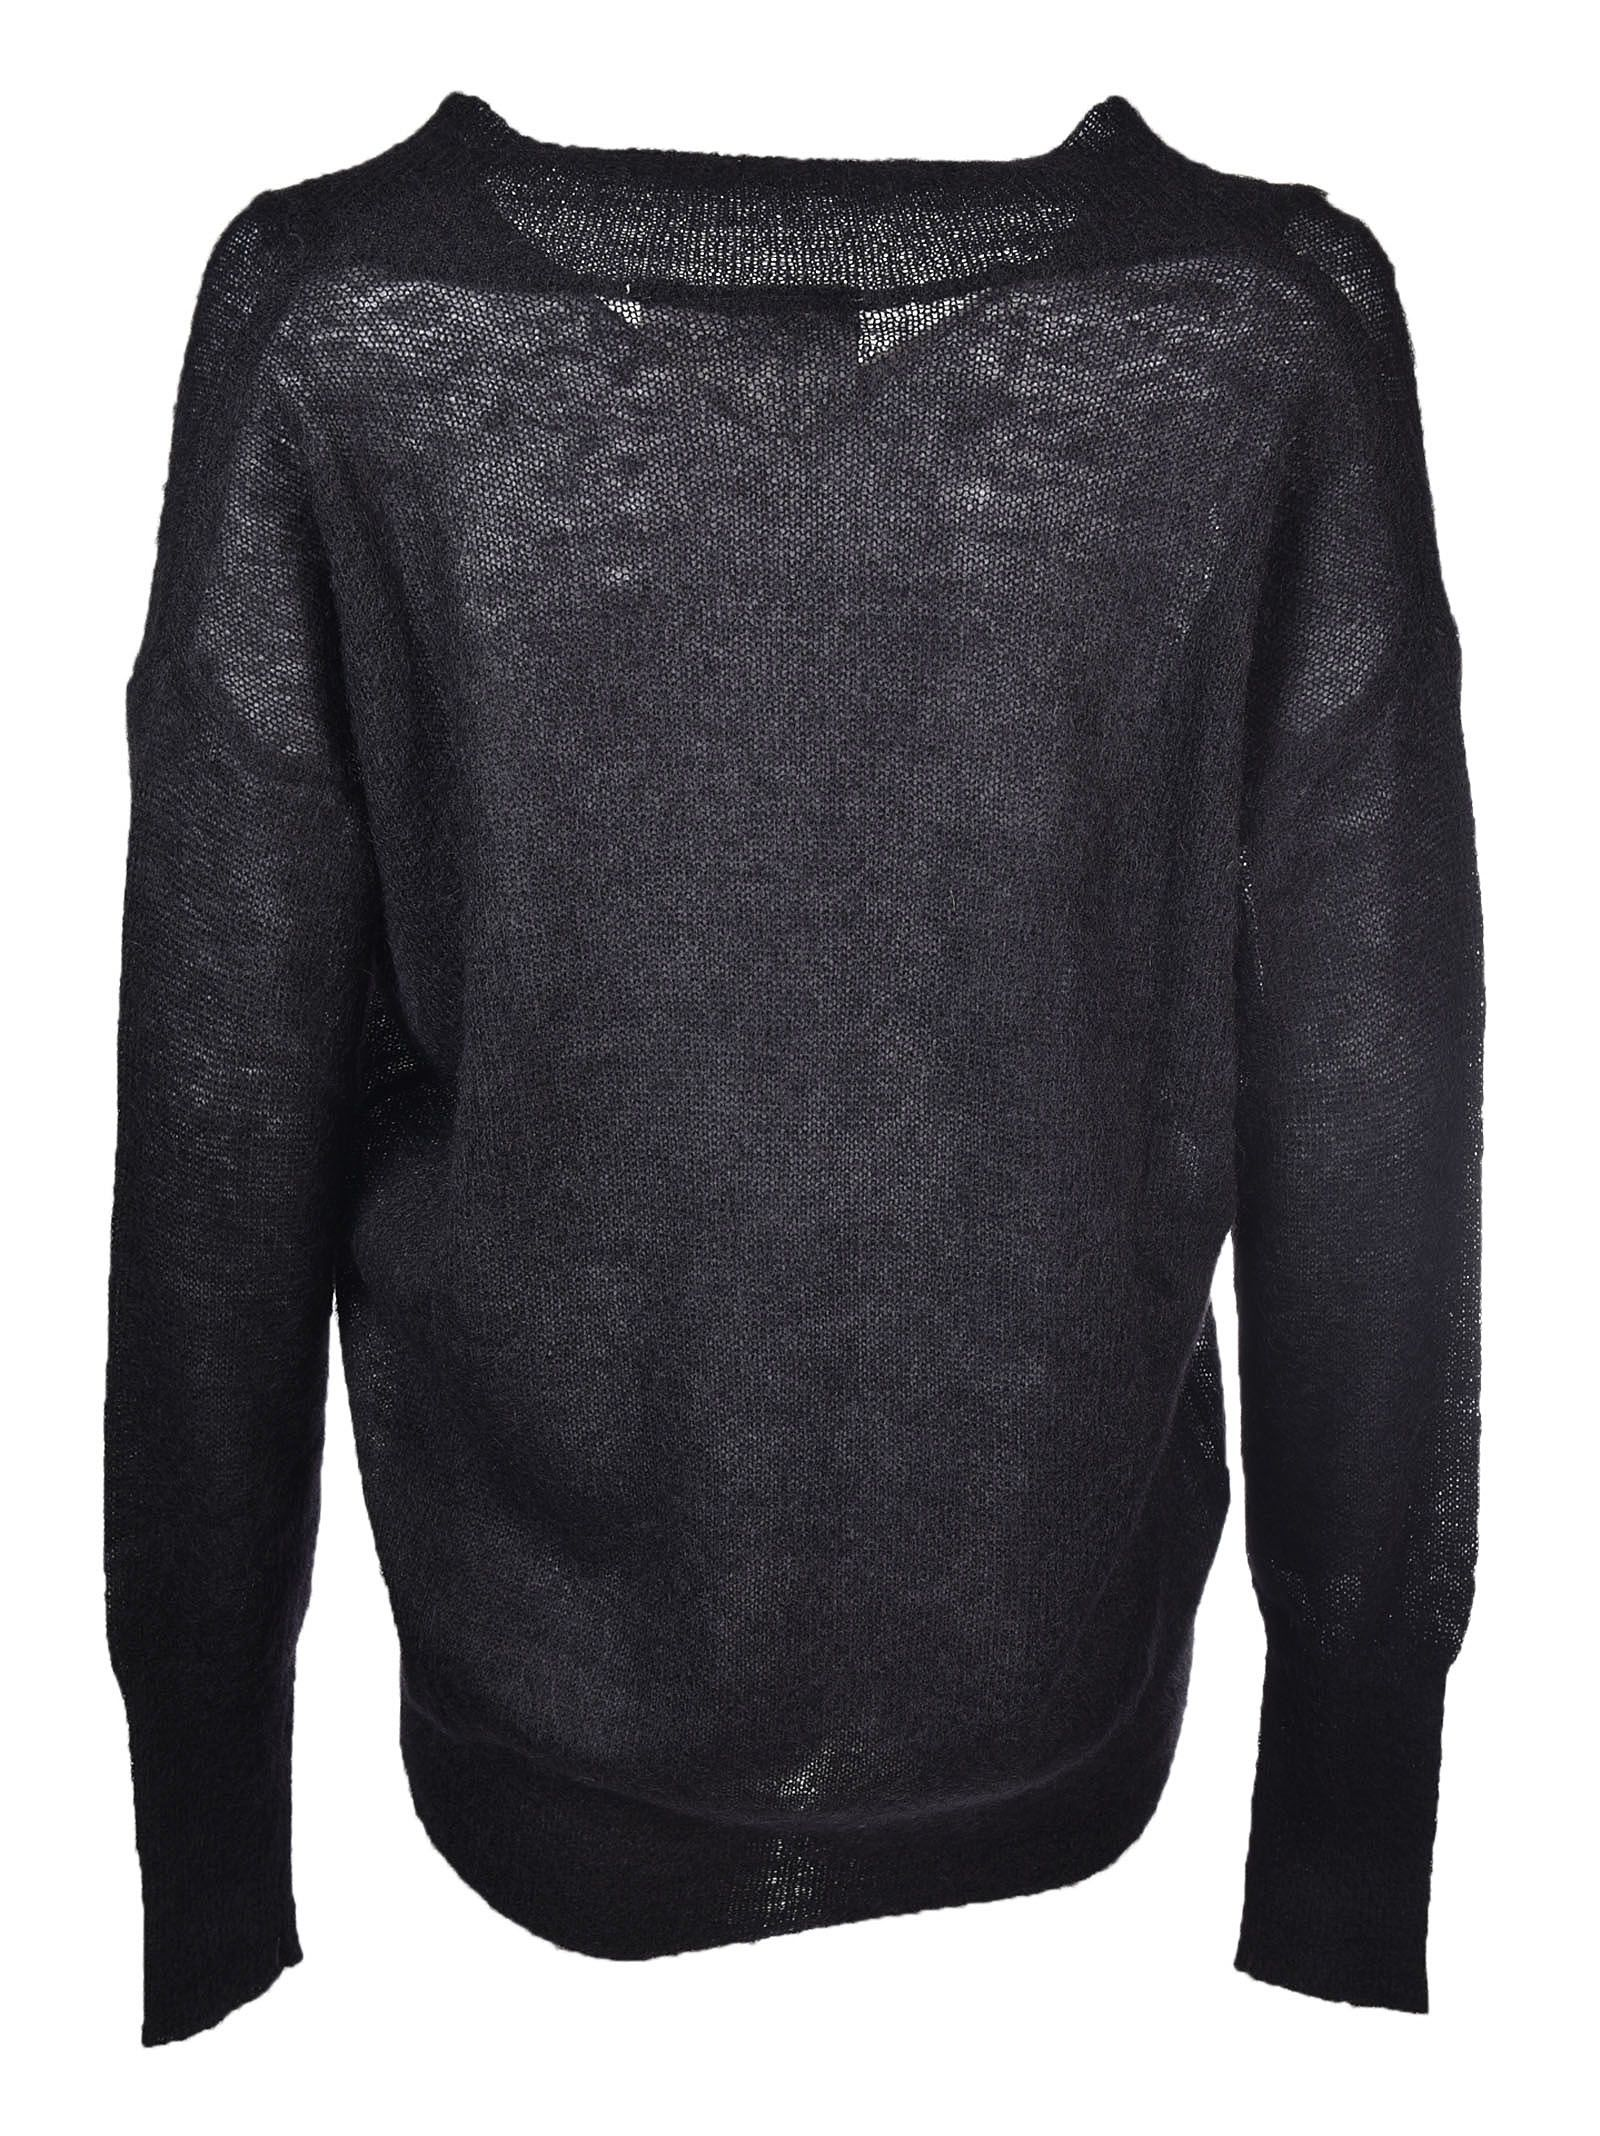 8PM - 8PM V-Neck Sweater - Black, Women's Sweaters | Italist